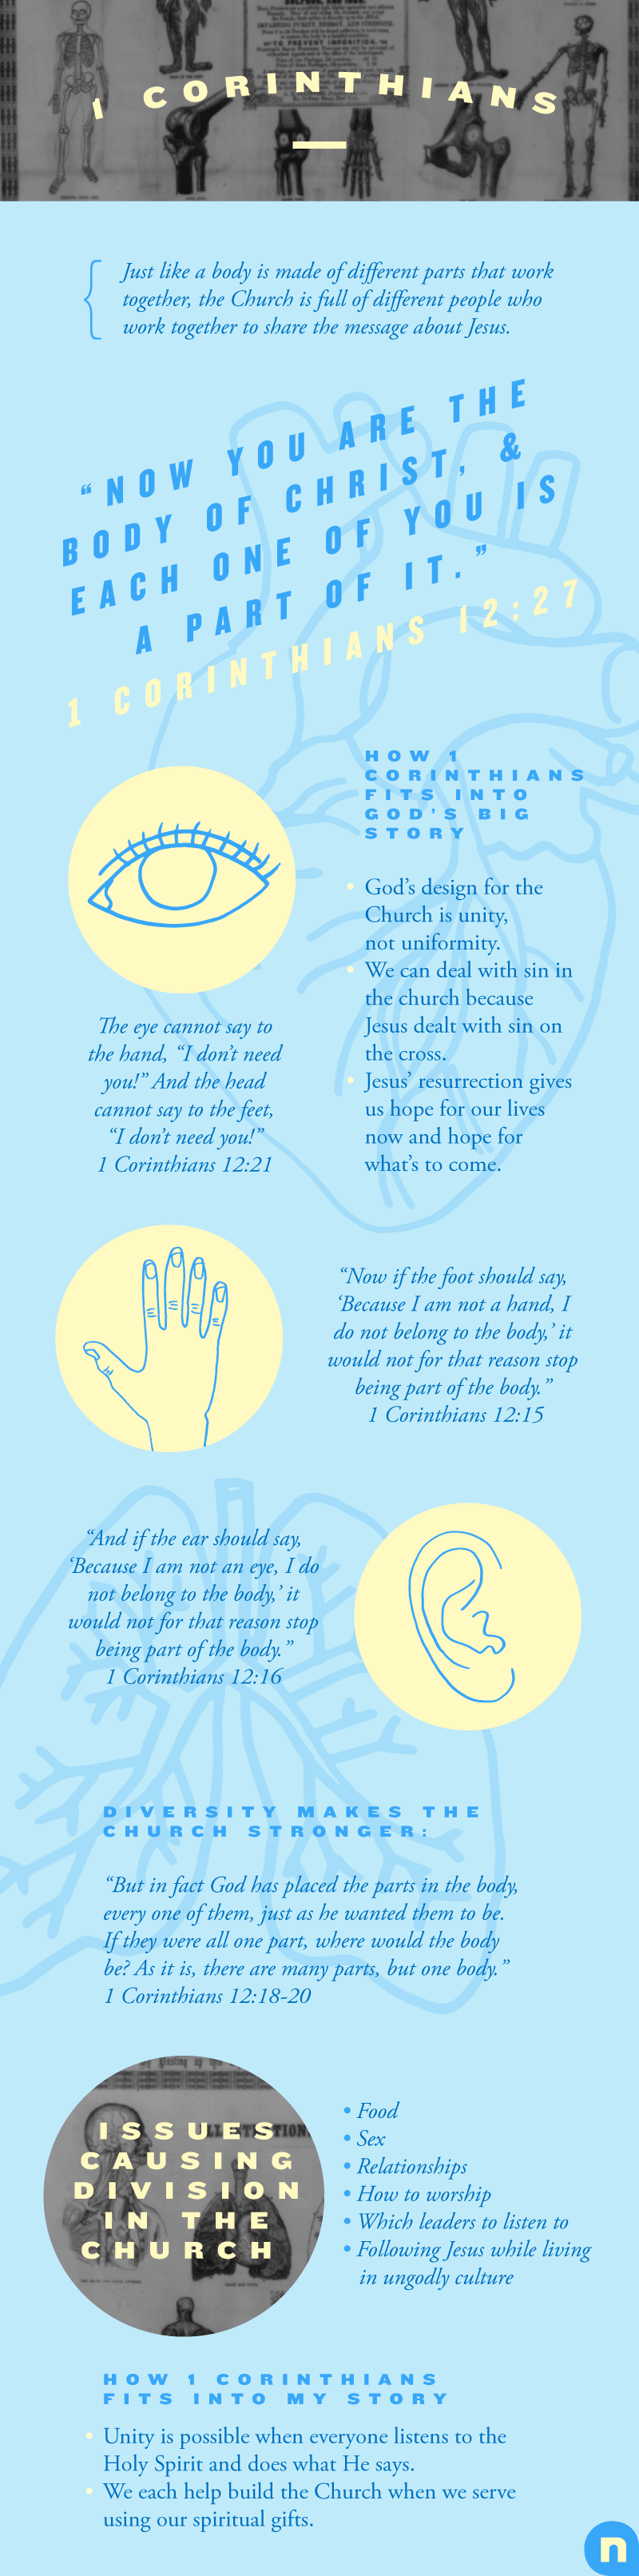 bible articles